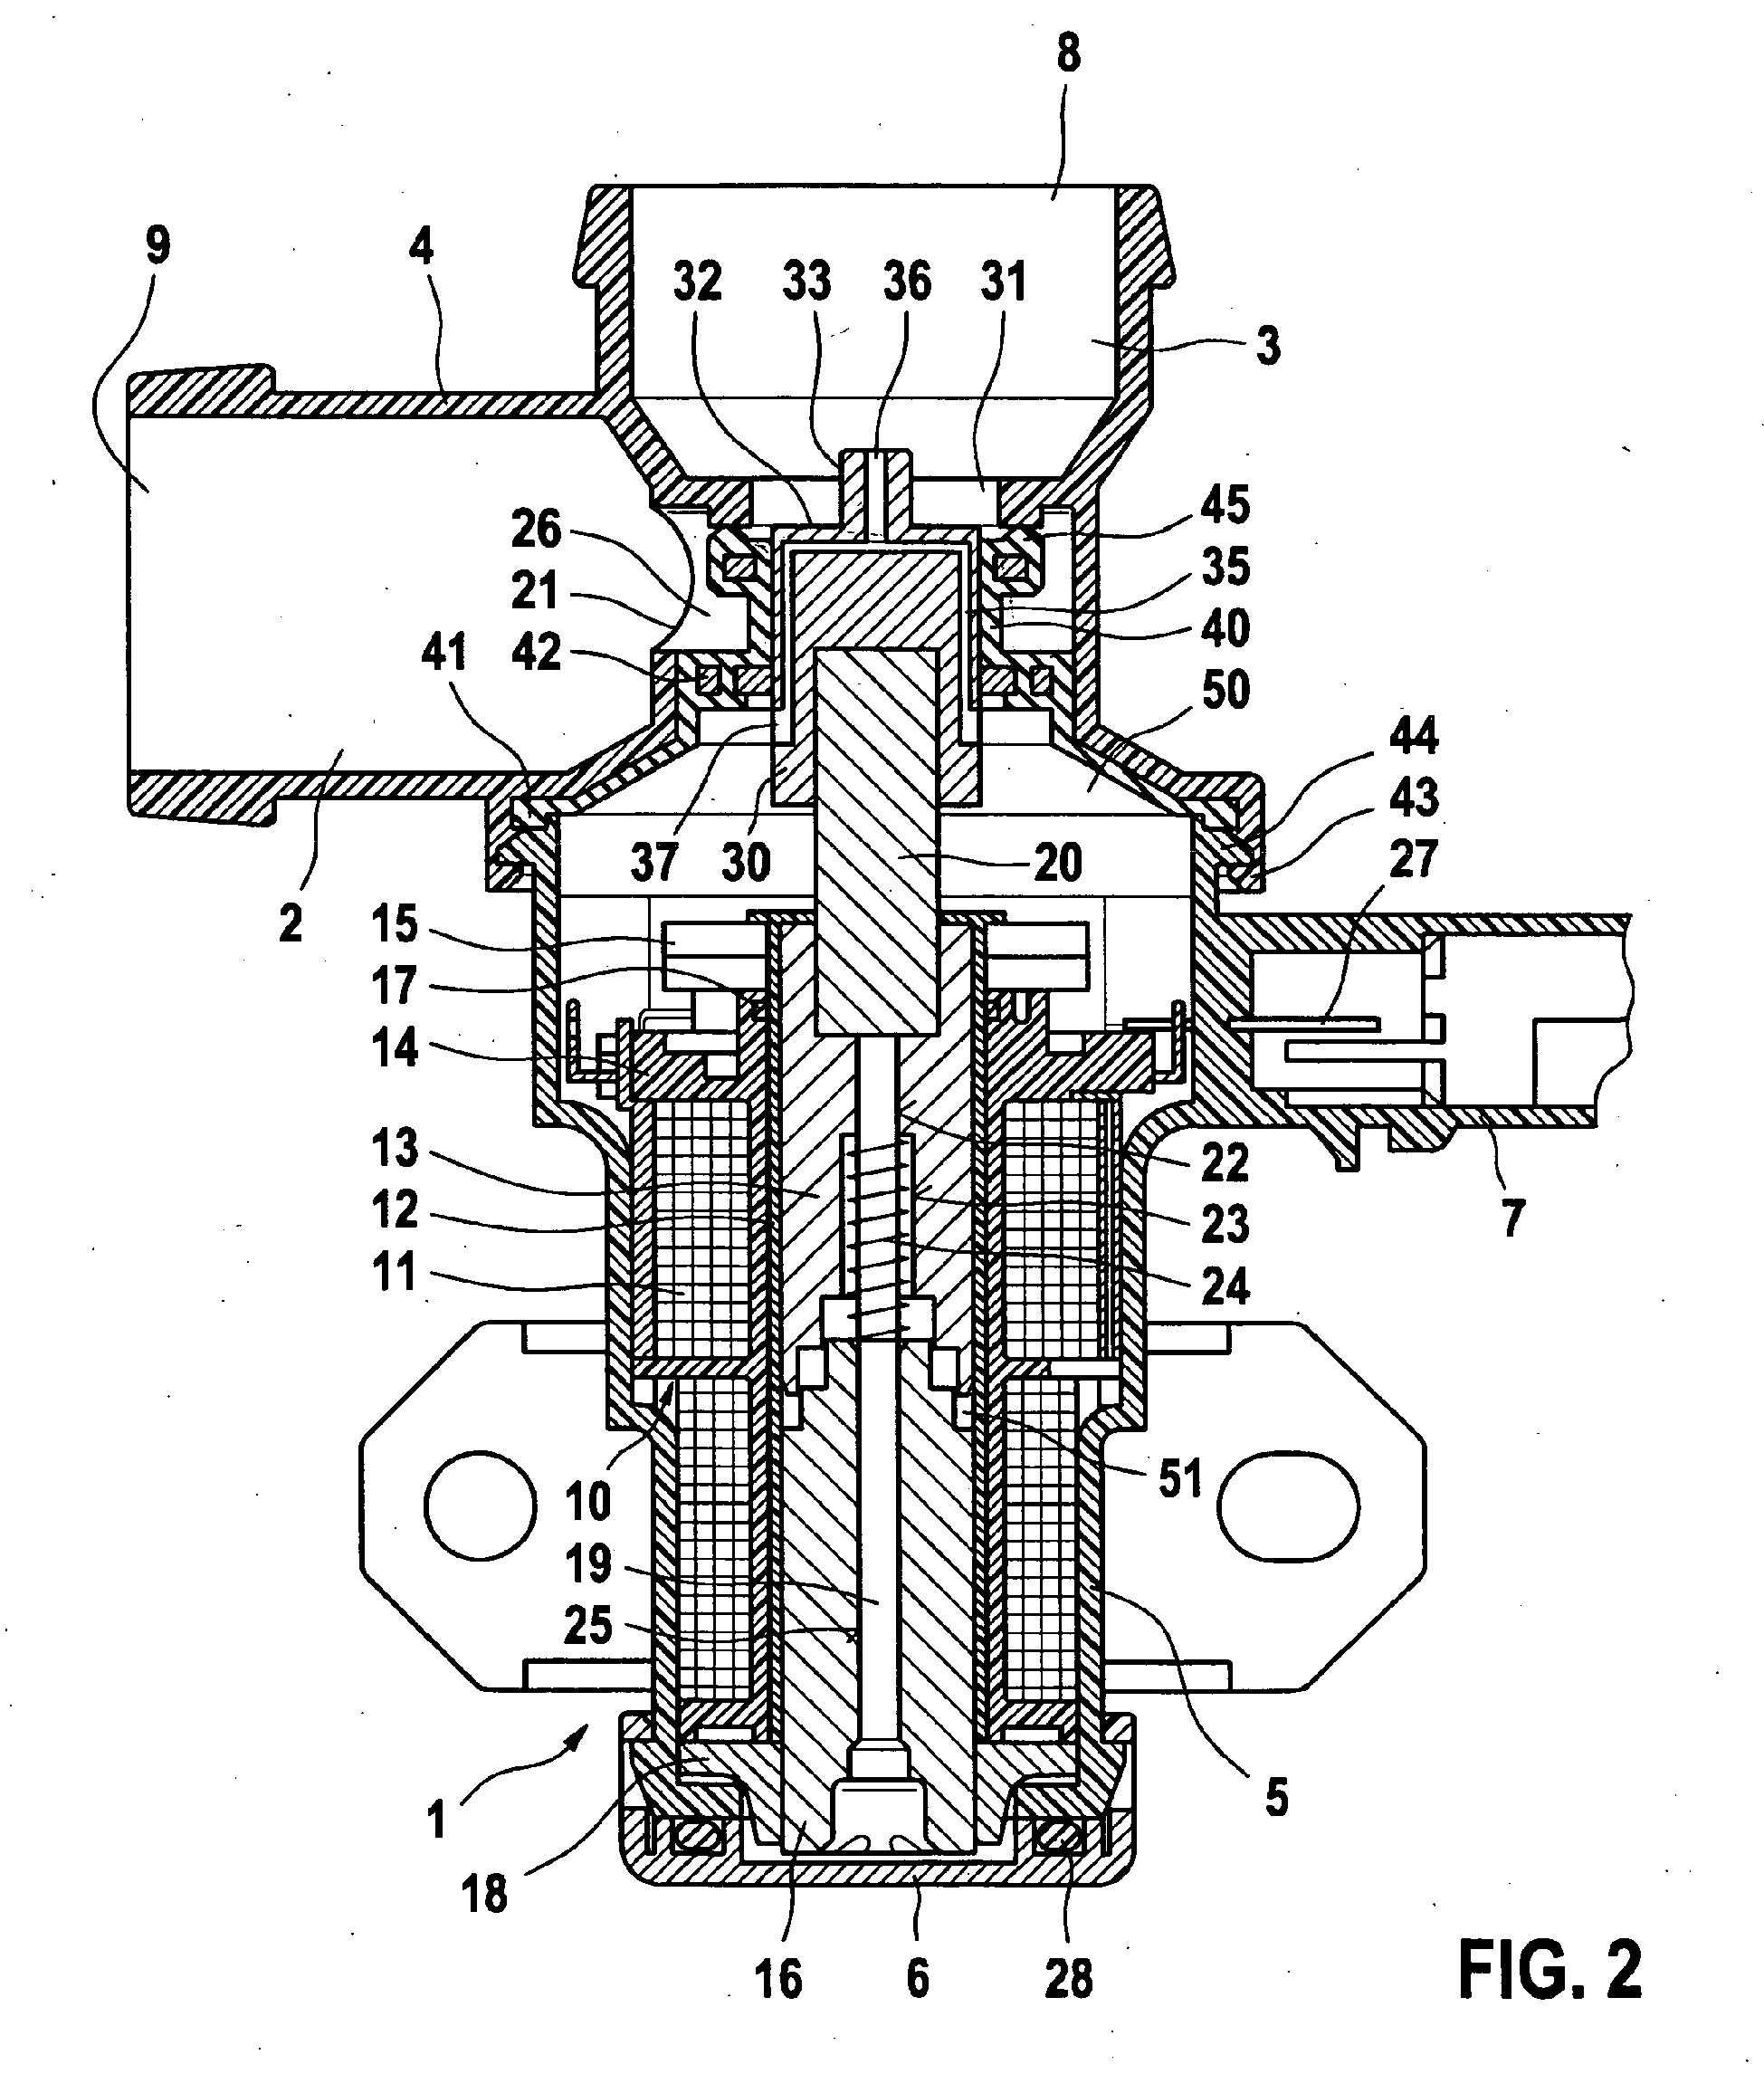 victory hammer wiring diagram detailed schematics diagram rh lelandlutheran com Victory Jackpot Wiring-Diagram Victory Motorcycle Wiring Diagram